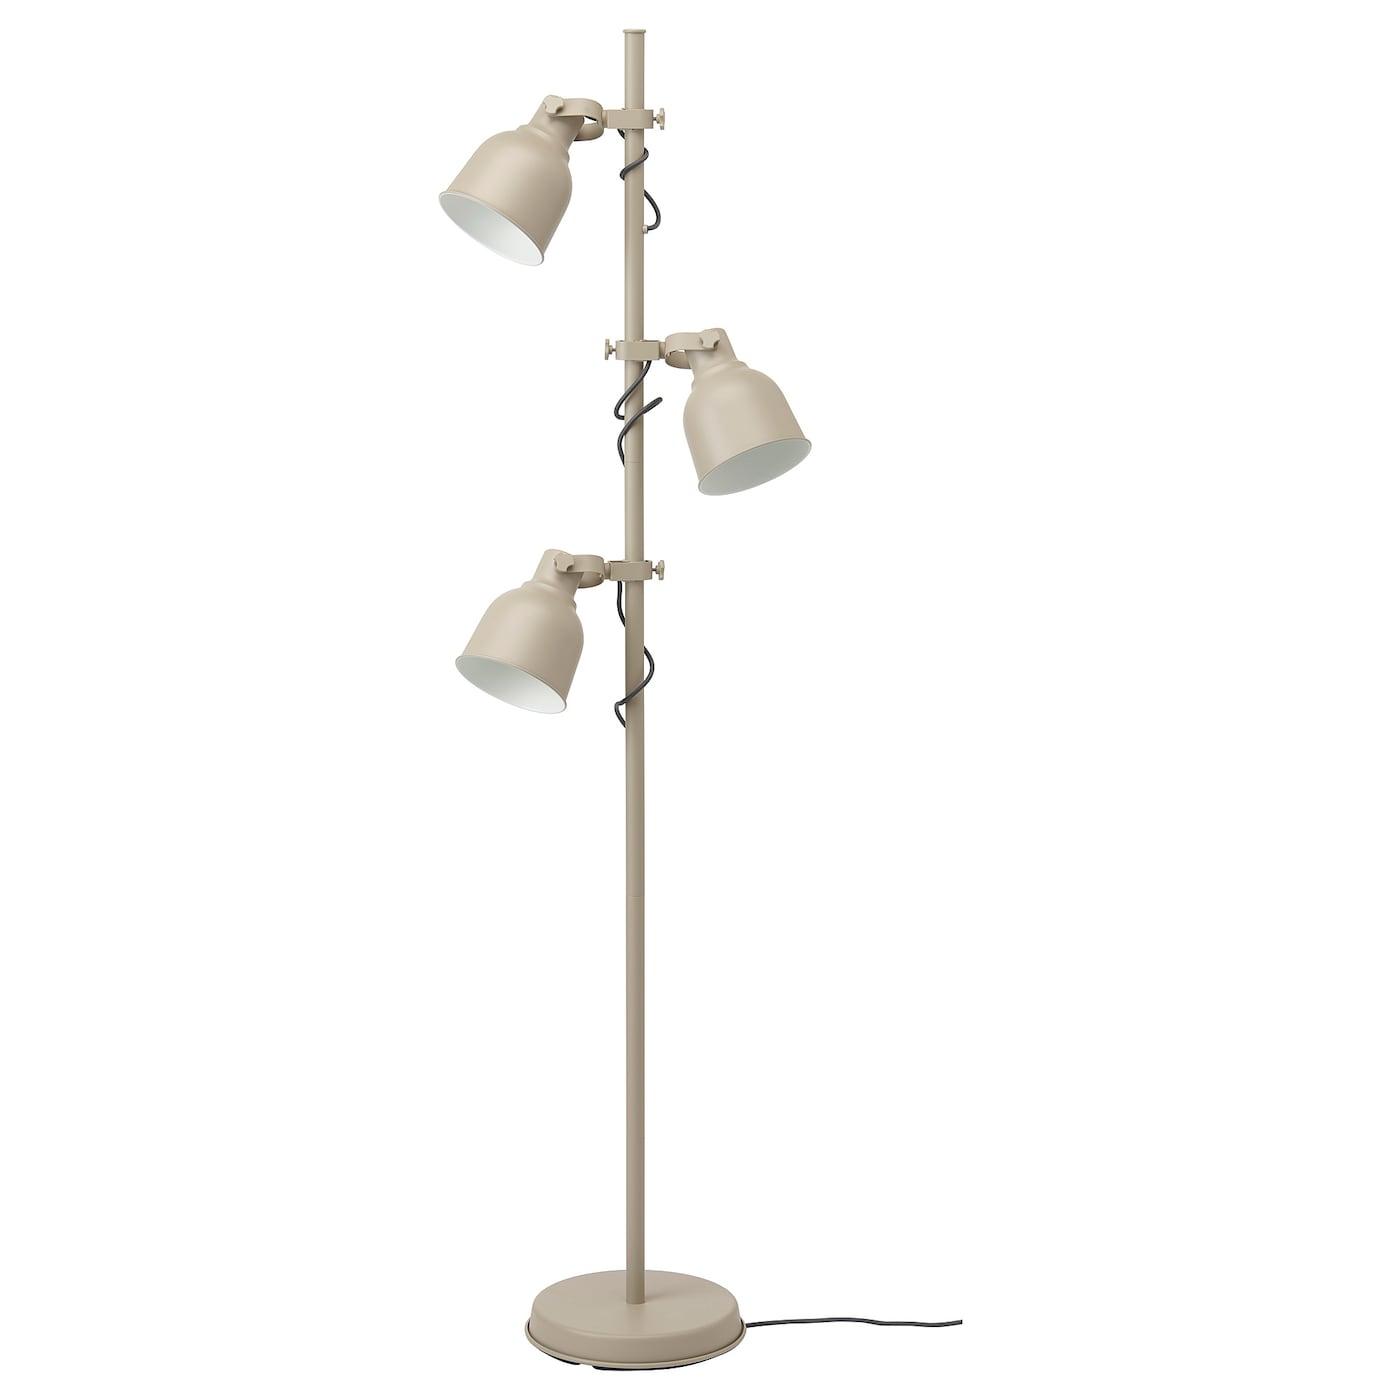 Blanc 176 Cm De Haut Lampadaire Ikea Not Avec Lampe De ... concernant Banc De Jardin Ikea